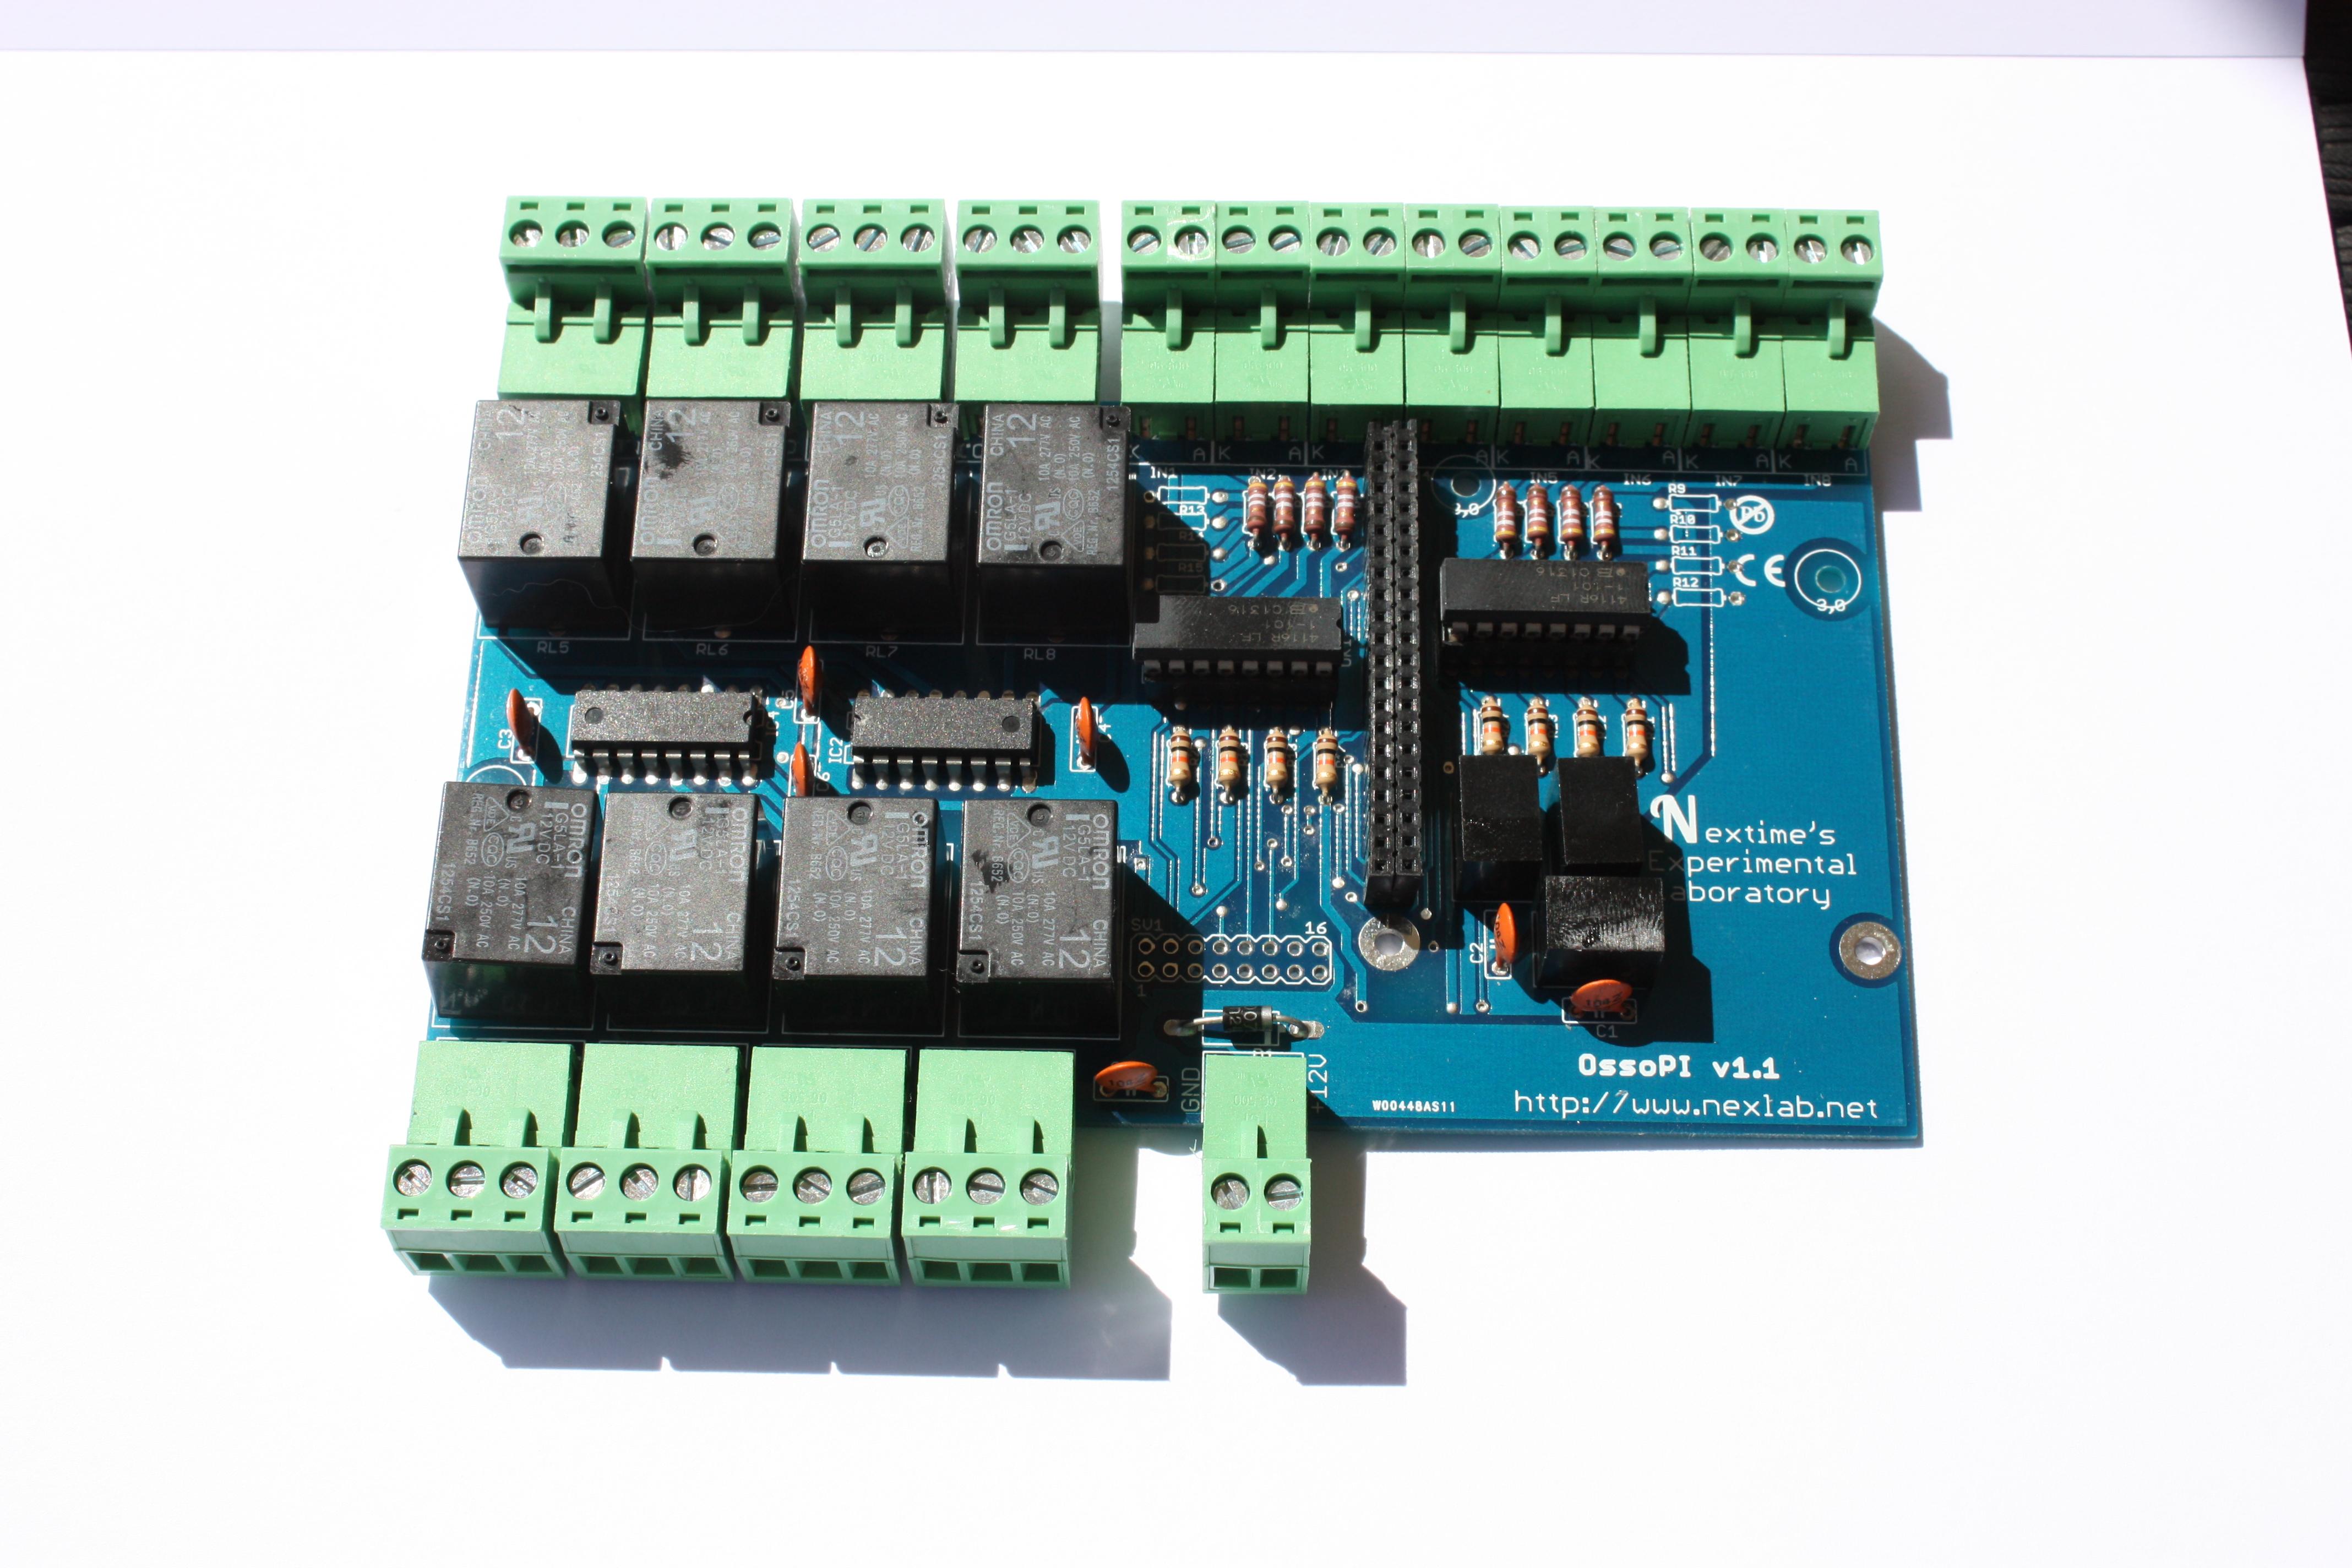 OssoPI Raspberry PI (1 B+ or 2) I/O expansion board